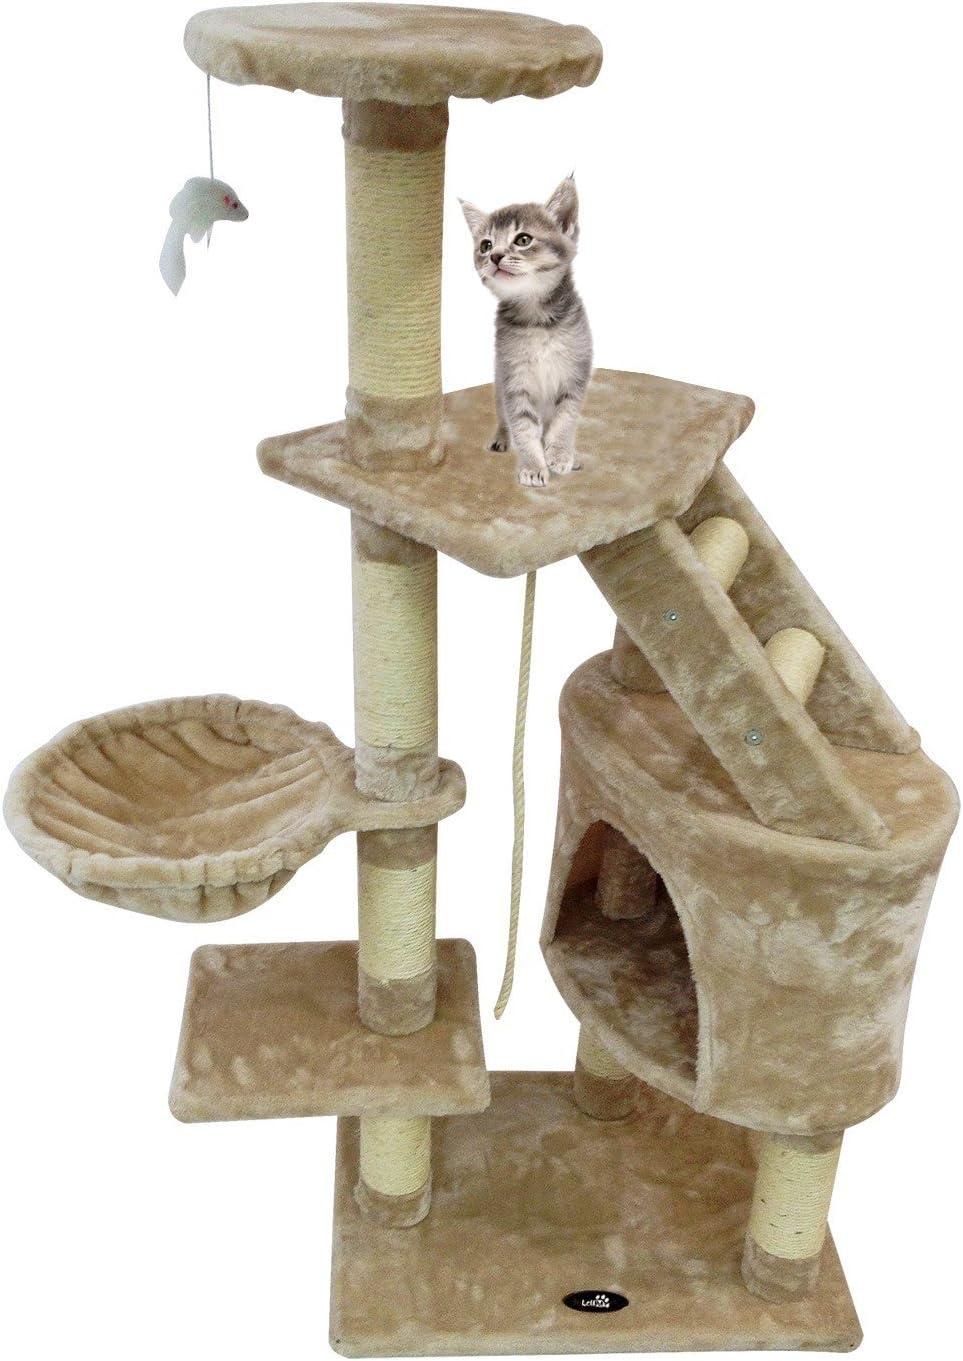 Todeco - Árbol para Gatos, Escalador para Gatos - Material: MDF - Tamaño de la casa de Gato: 30,0 x 30,0 x 42,9 cm - 120 cm, 5 Plataformas, Beige